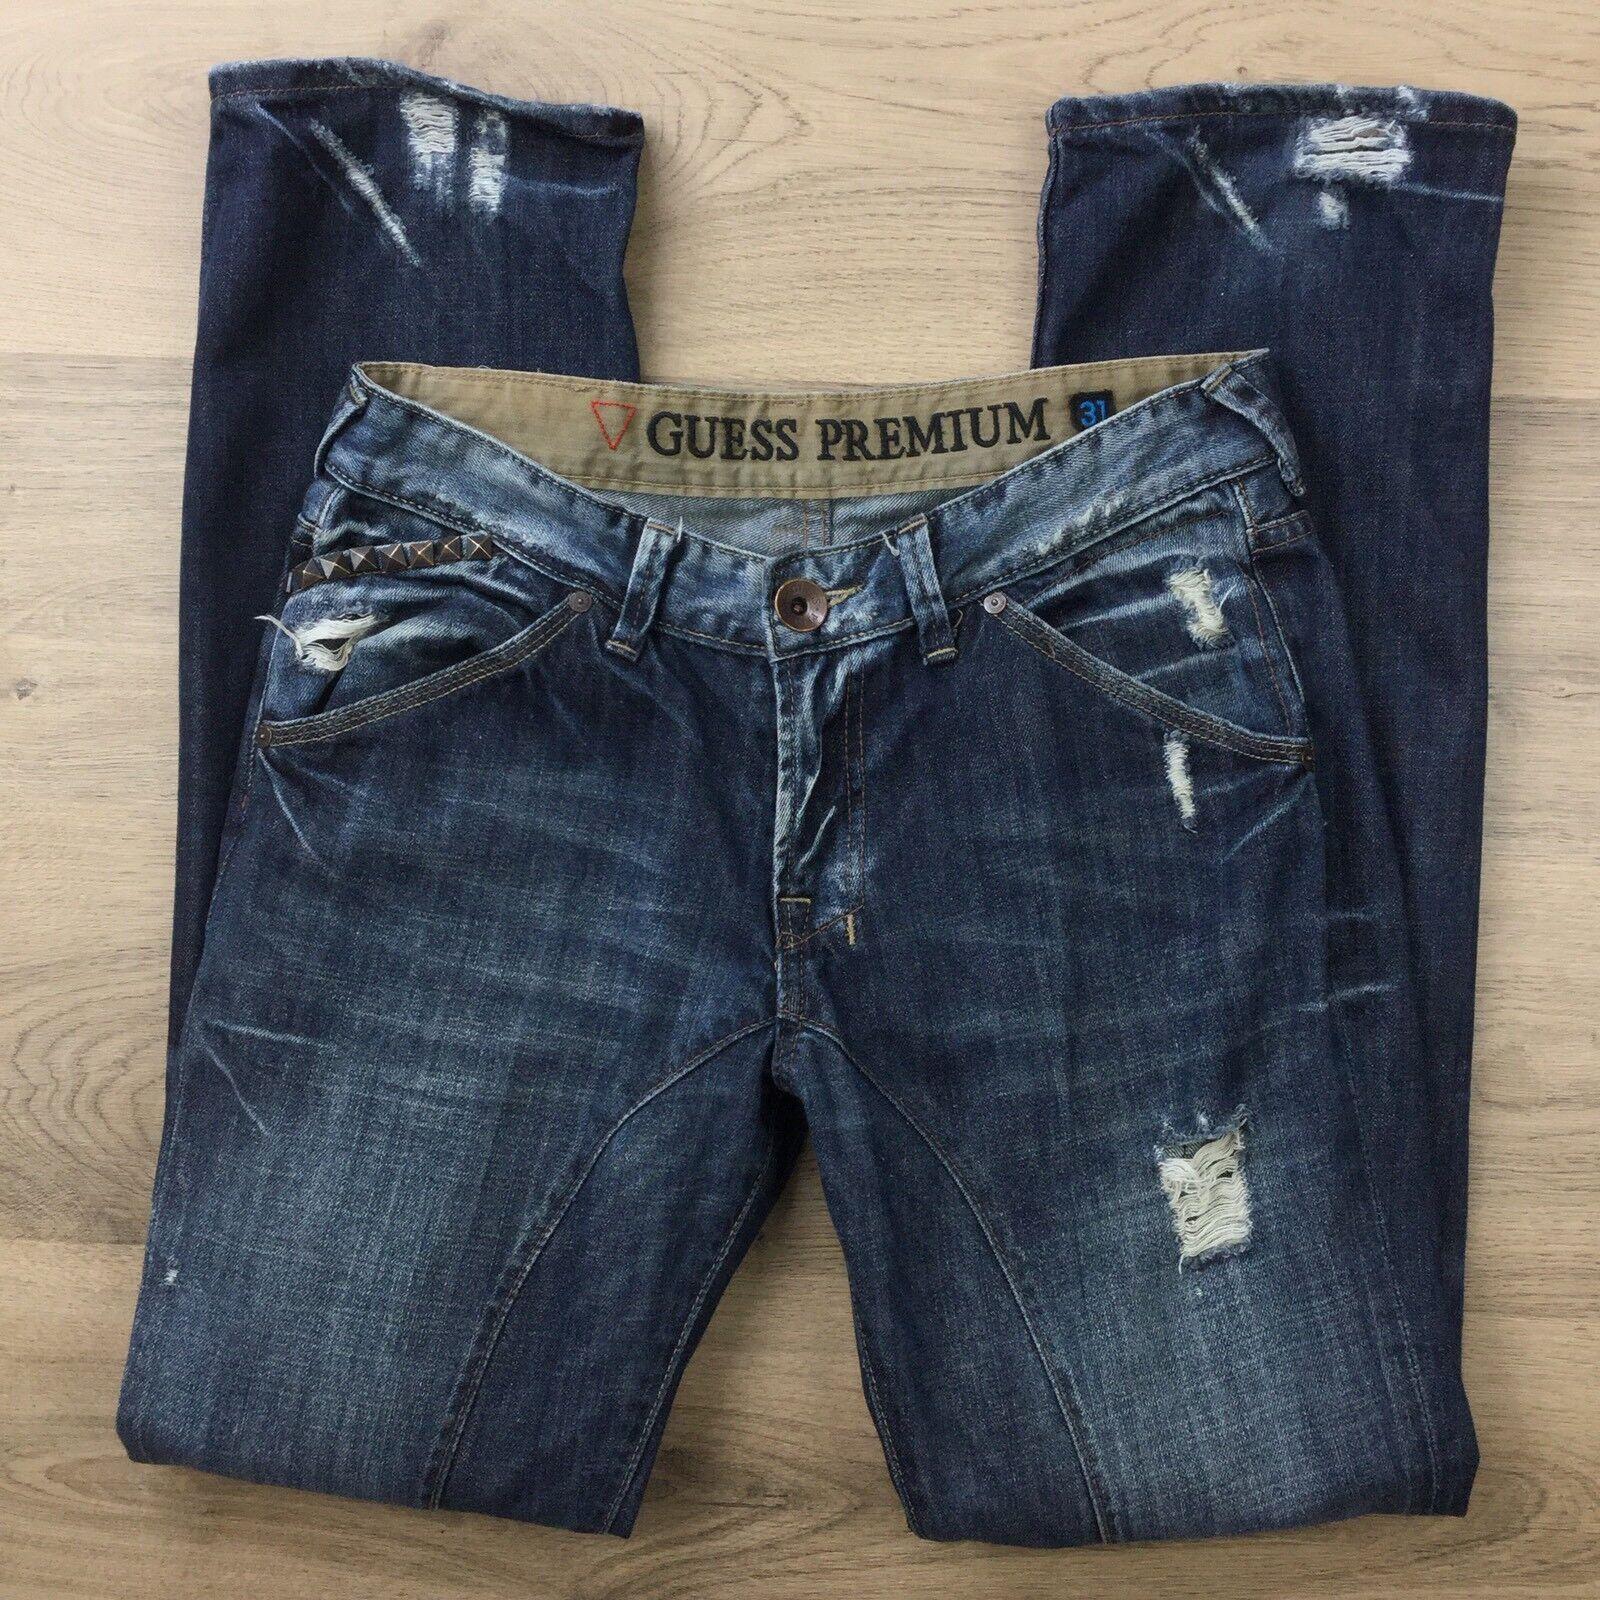 Guess Premium  Distressed Size 31 Men's bluee Denim Jeans 100% Cotton (BQ18)